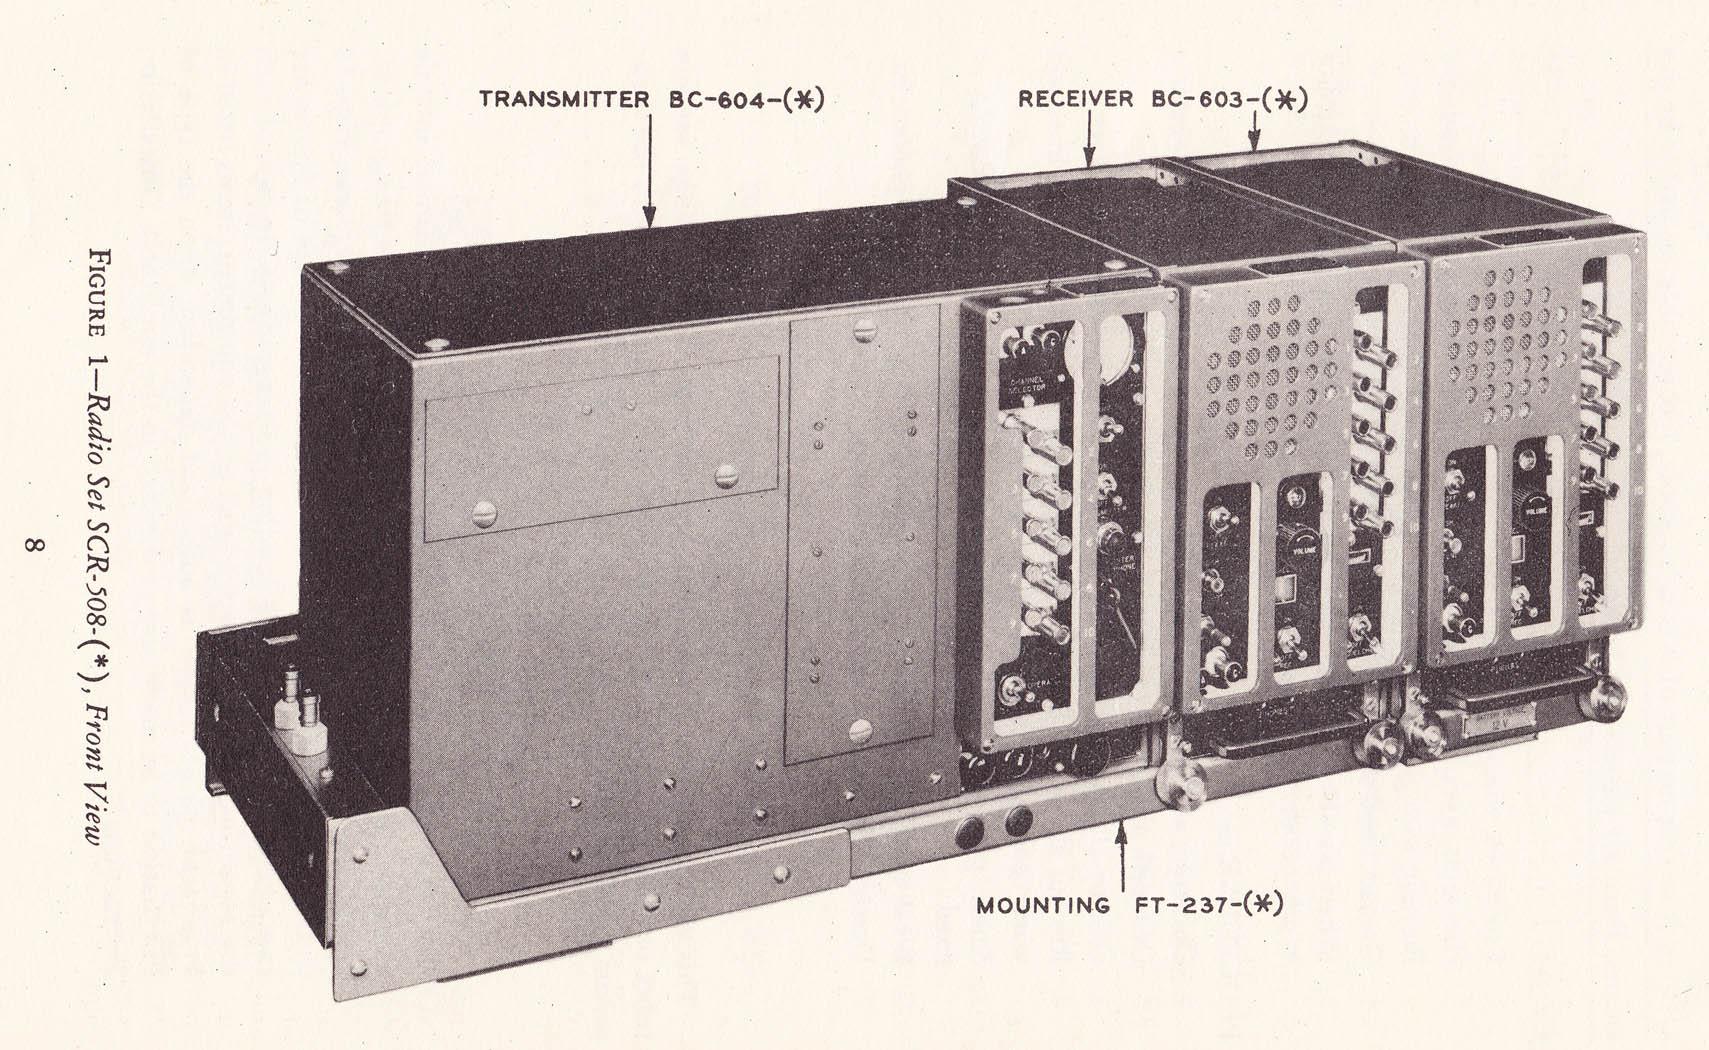 24 volt relay wiring diagram single phase reversing contactor scr-508 jumbo sherman installation